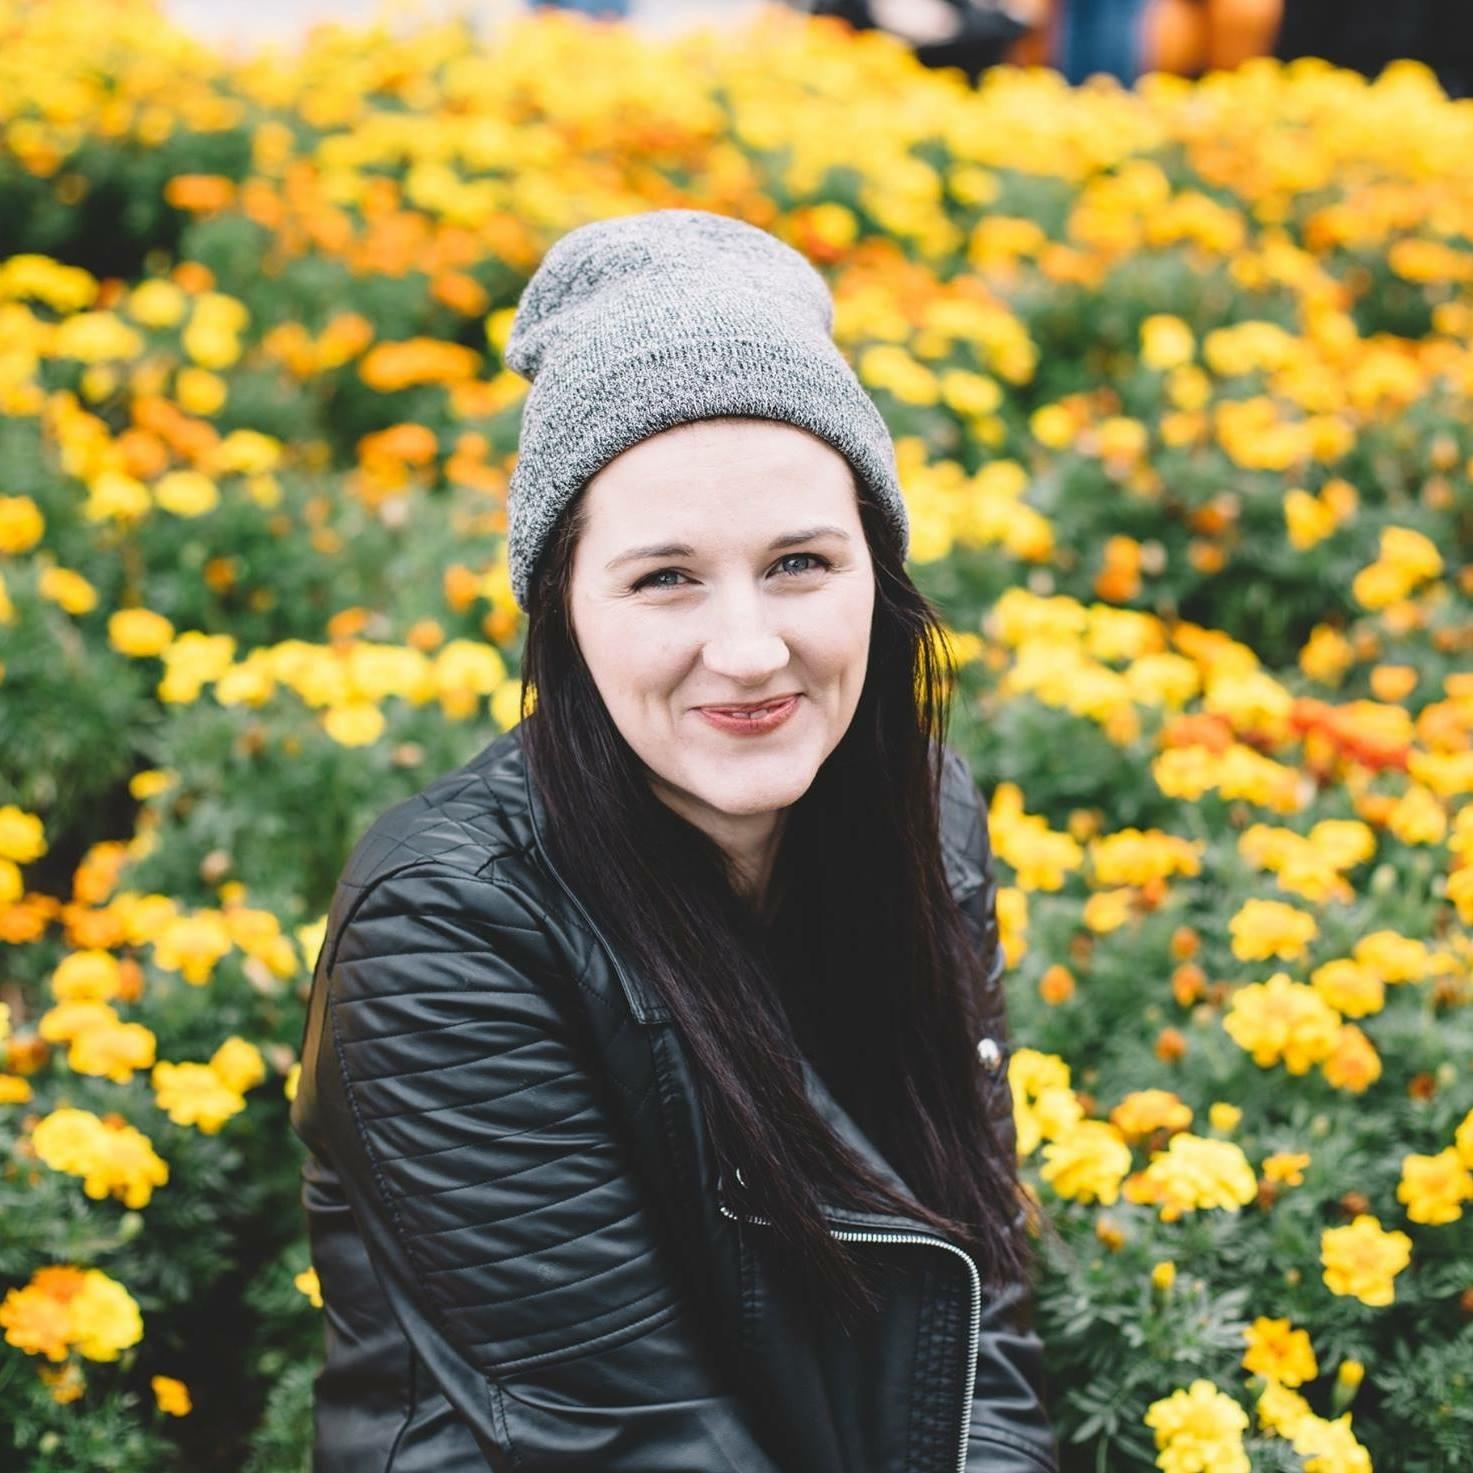 Renee Wold | Photographer